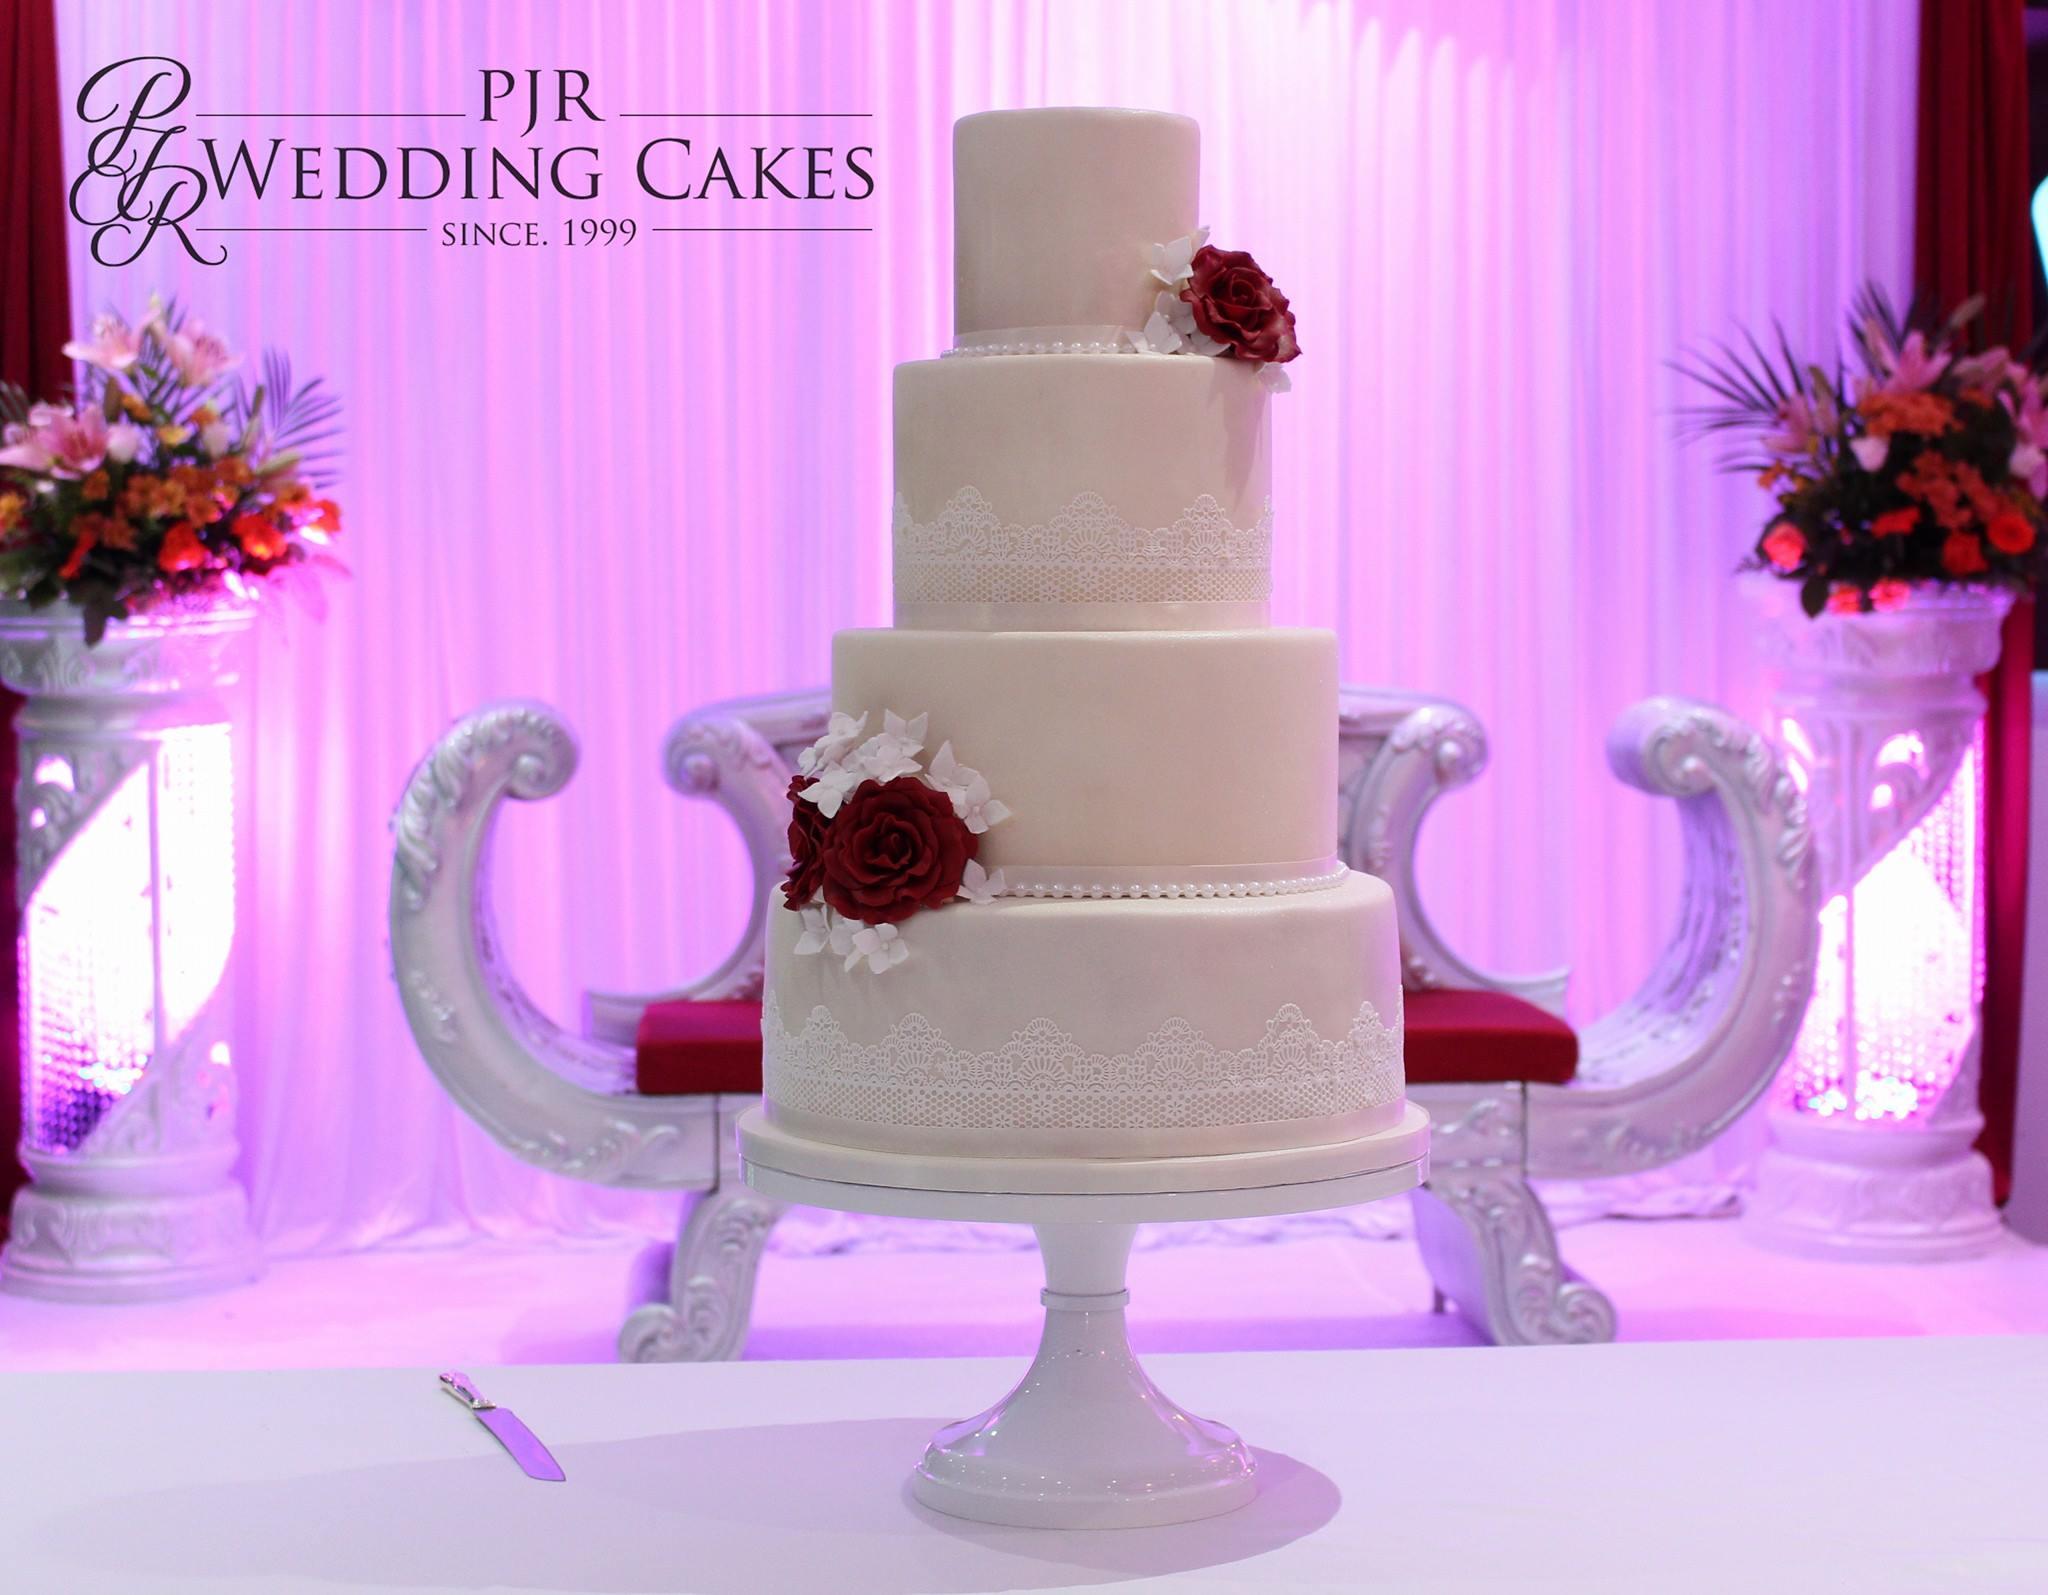 Pjr Wedding Cakes